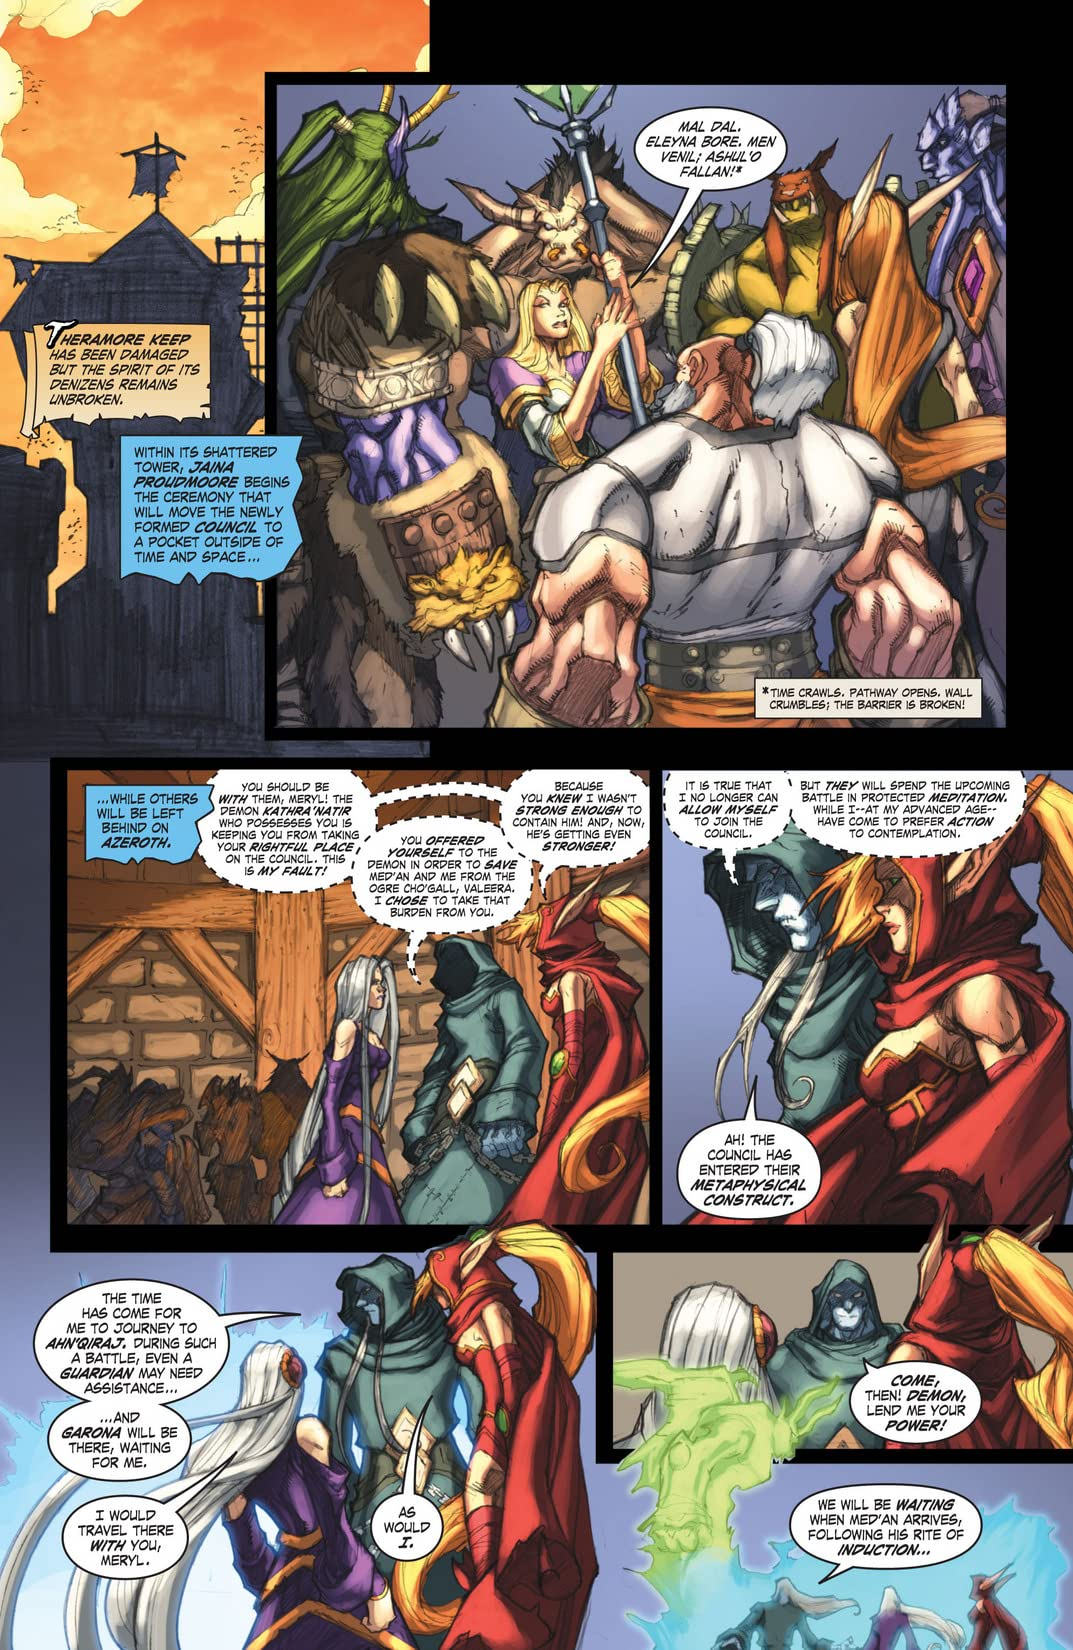 World of Warcraft #25